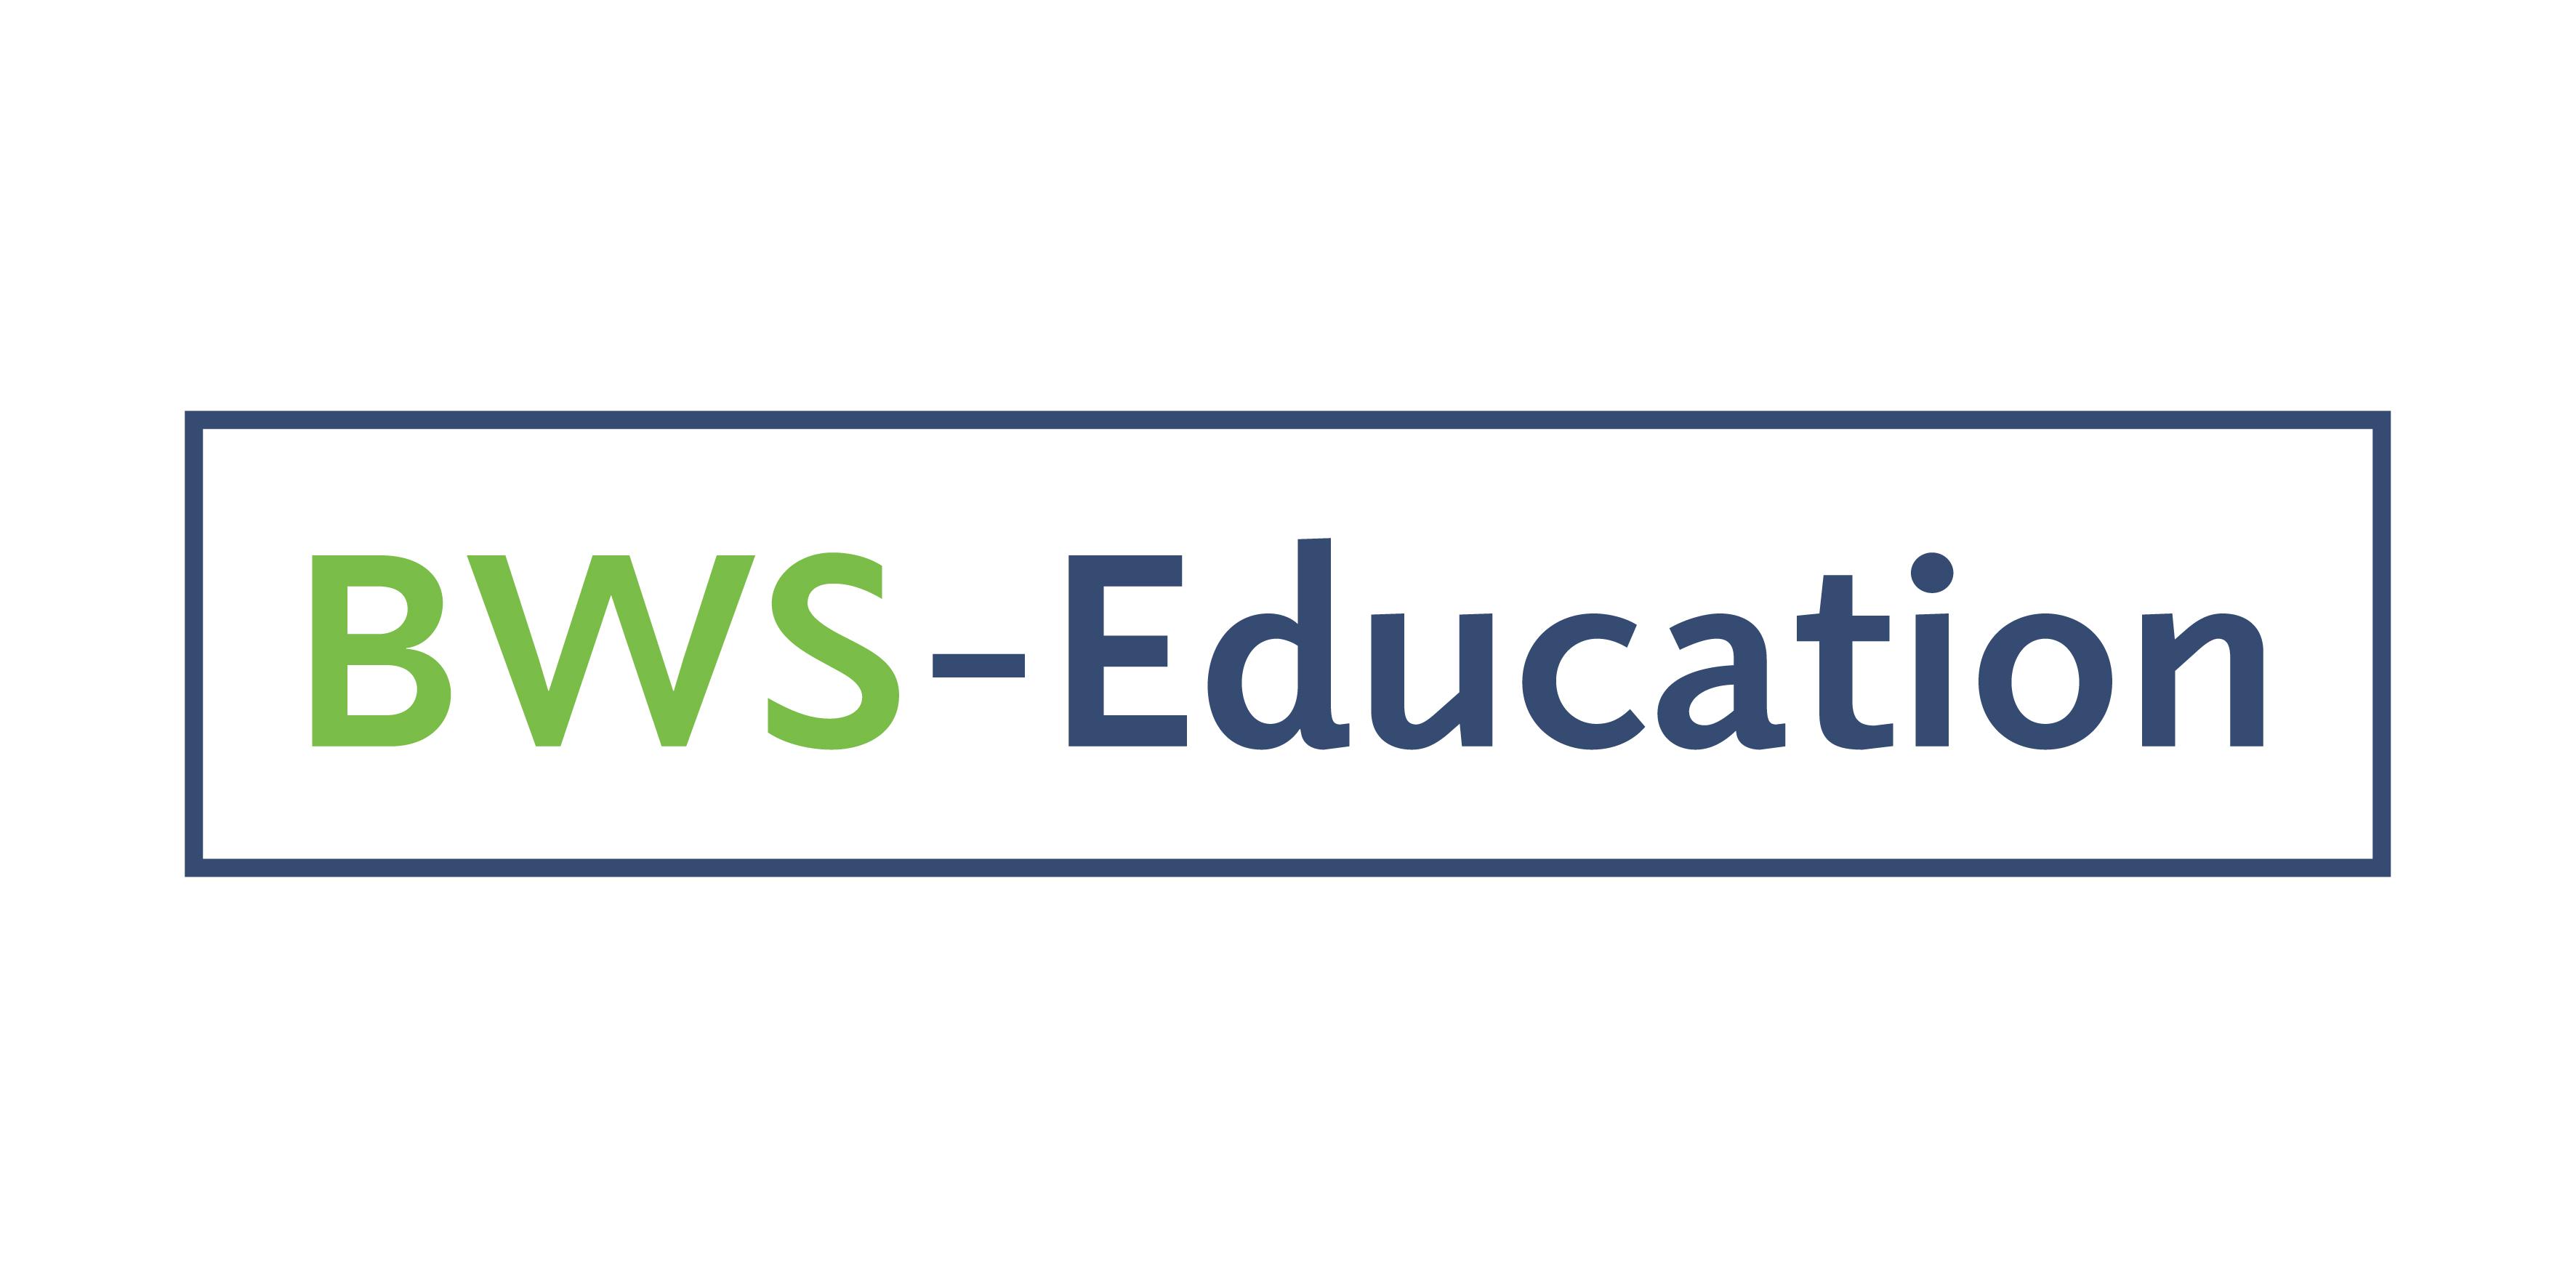 bws-education-01-01